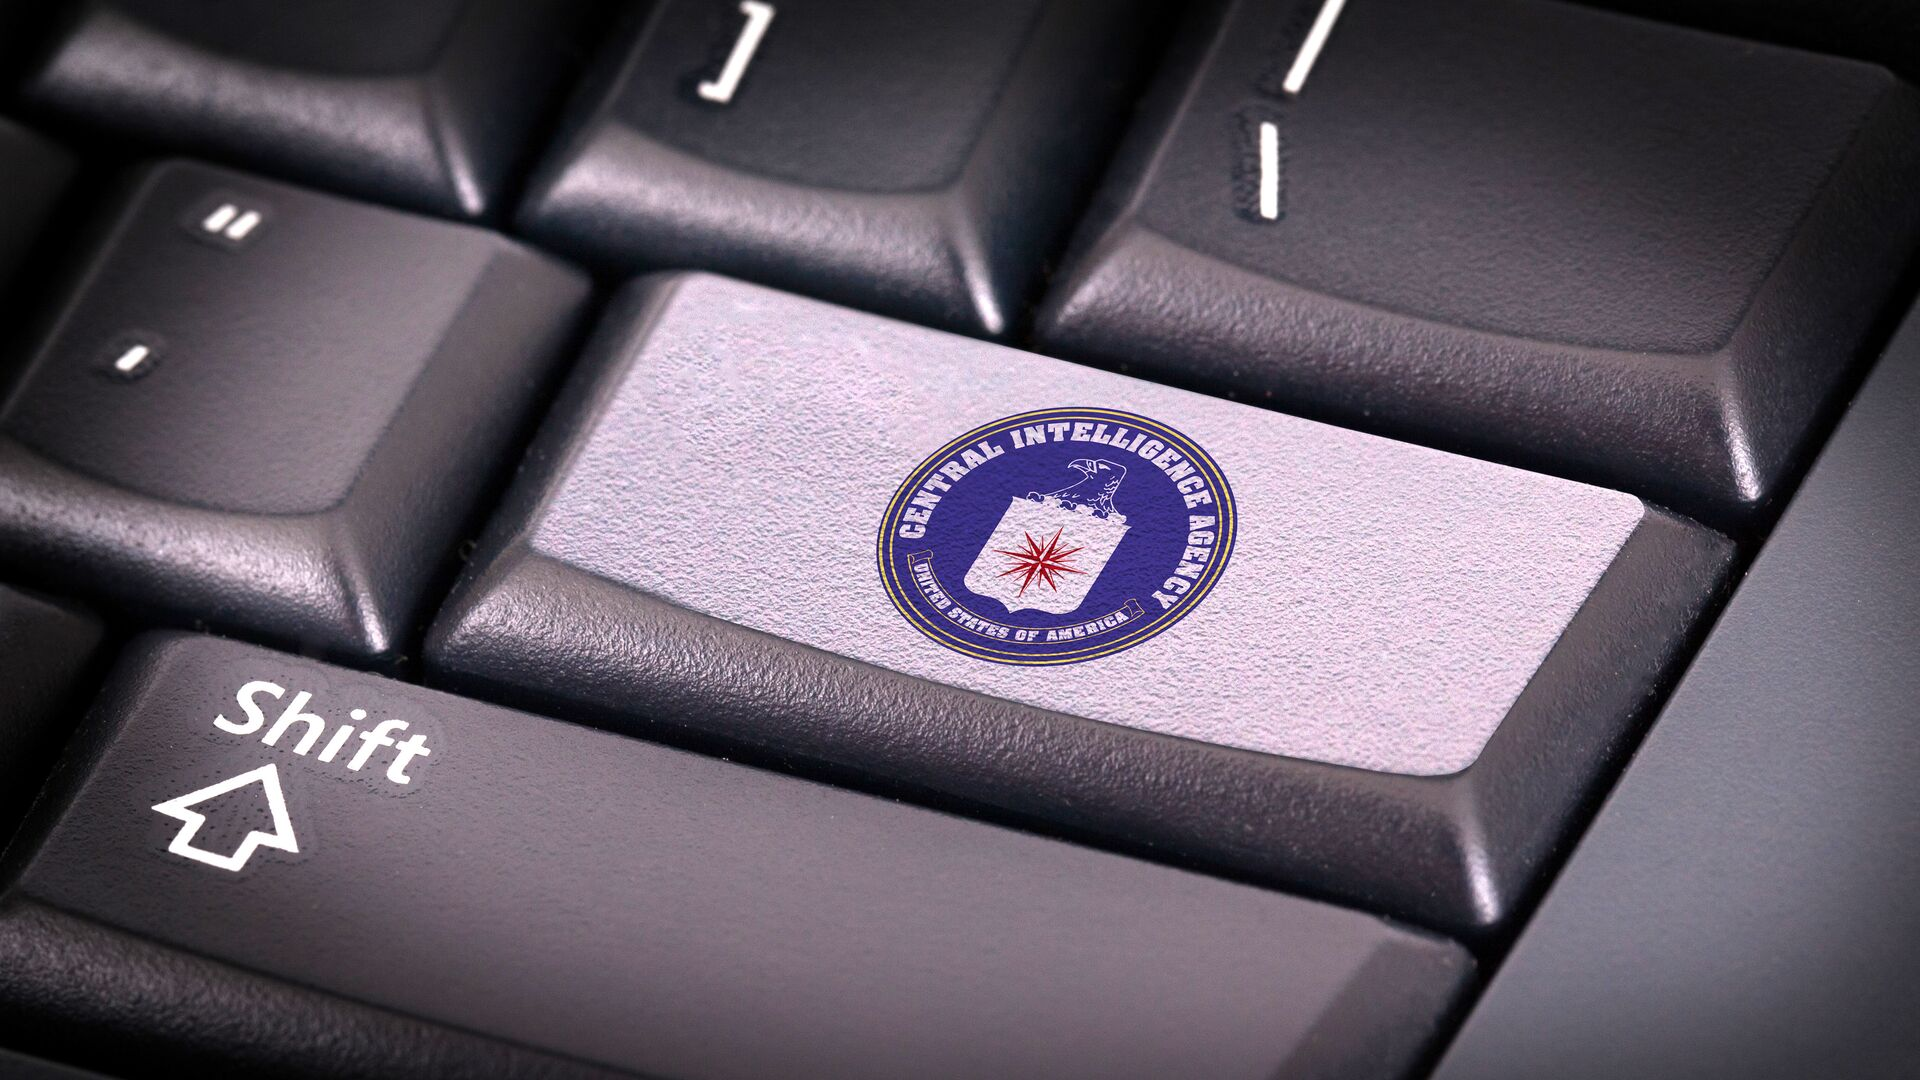 Логотип ЦРУ на клавиатуре - РИА Новости, 1920, 07.10.2021